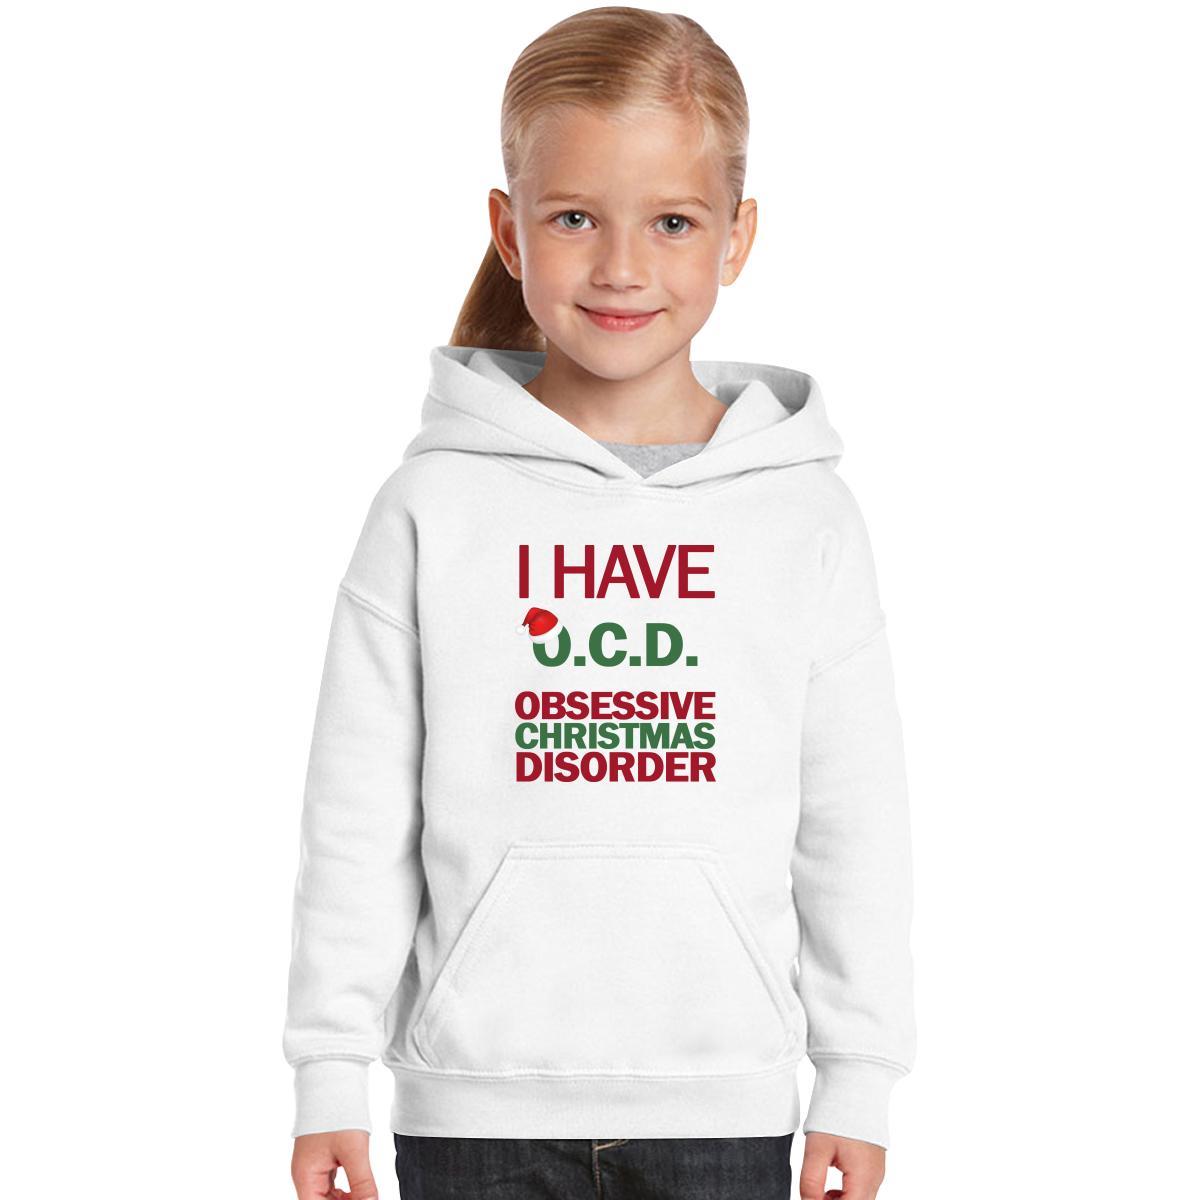 I Have O.C.D. Obsessive Christmas Disorder Kids Hoodie   Customon.com